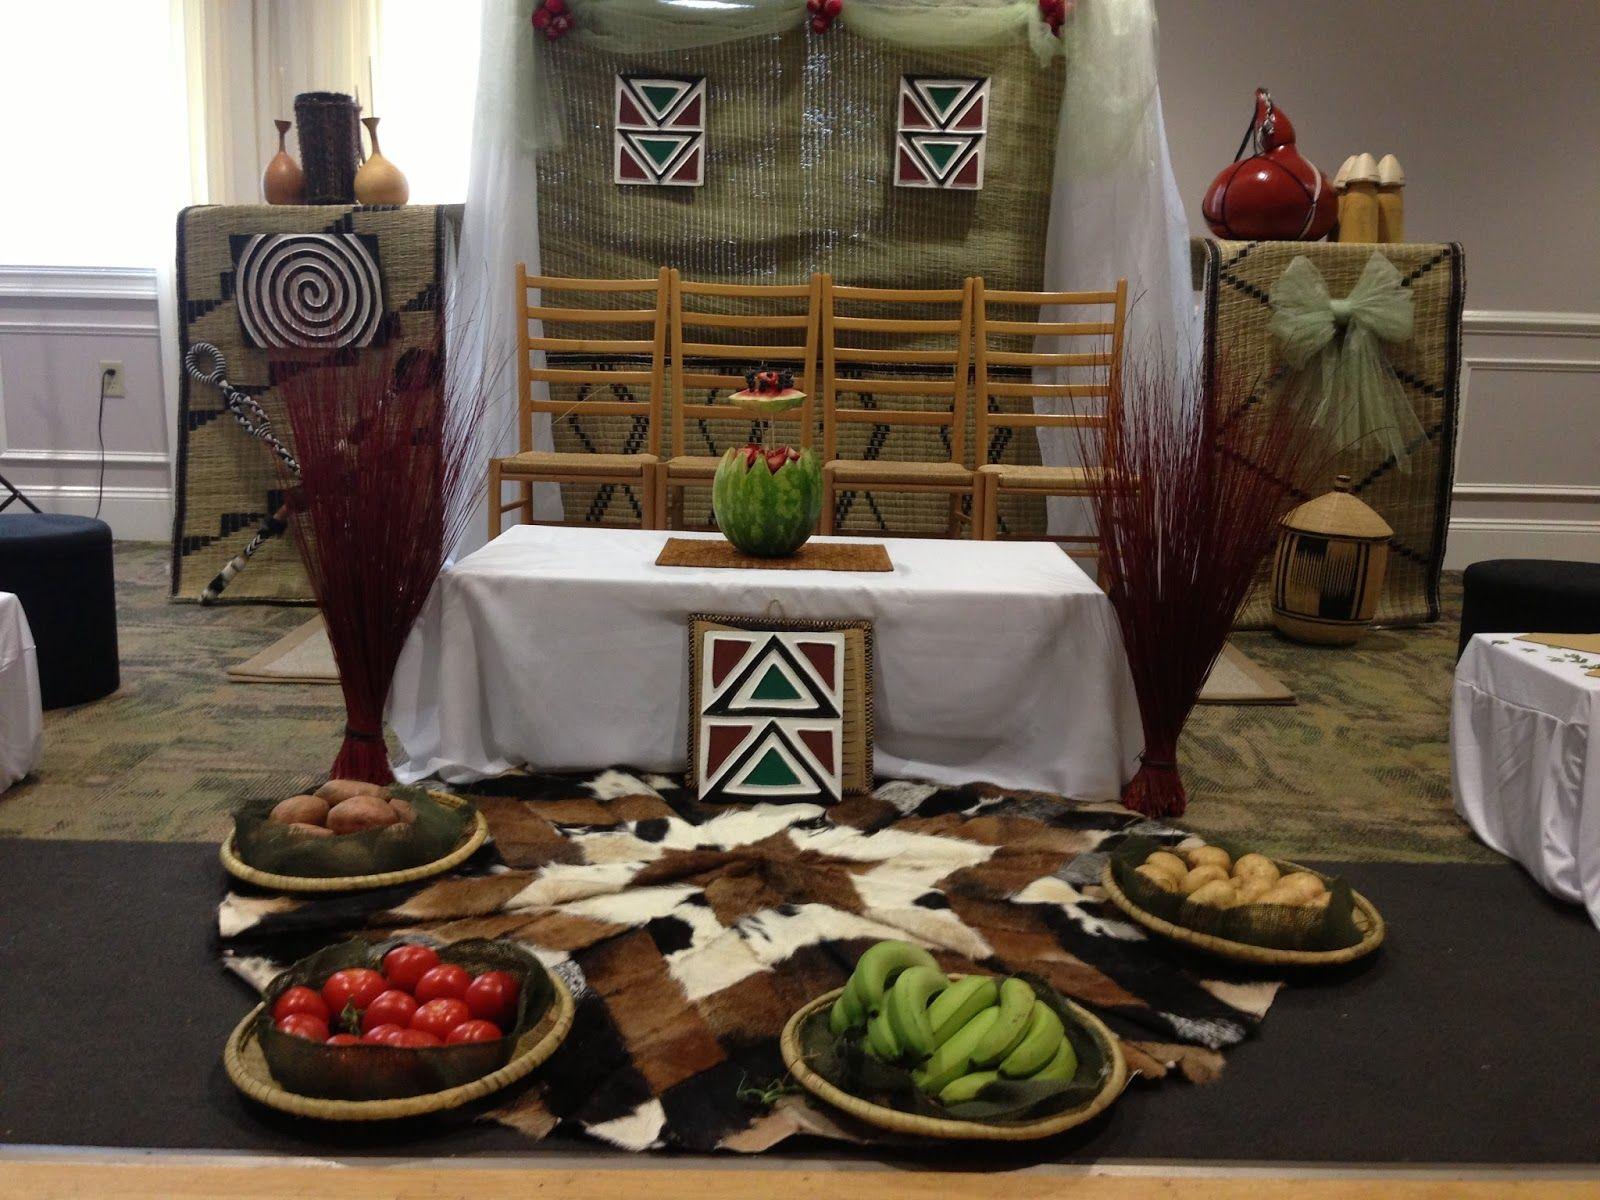 Simple traditional wedding decor ideas rwandan for Traditional wedding decor ideas